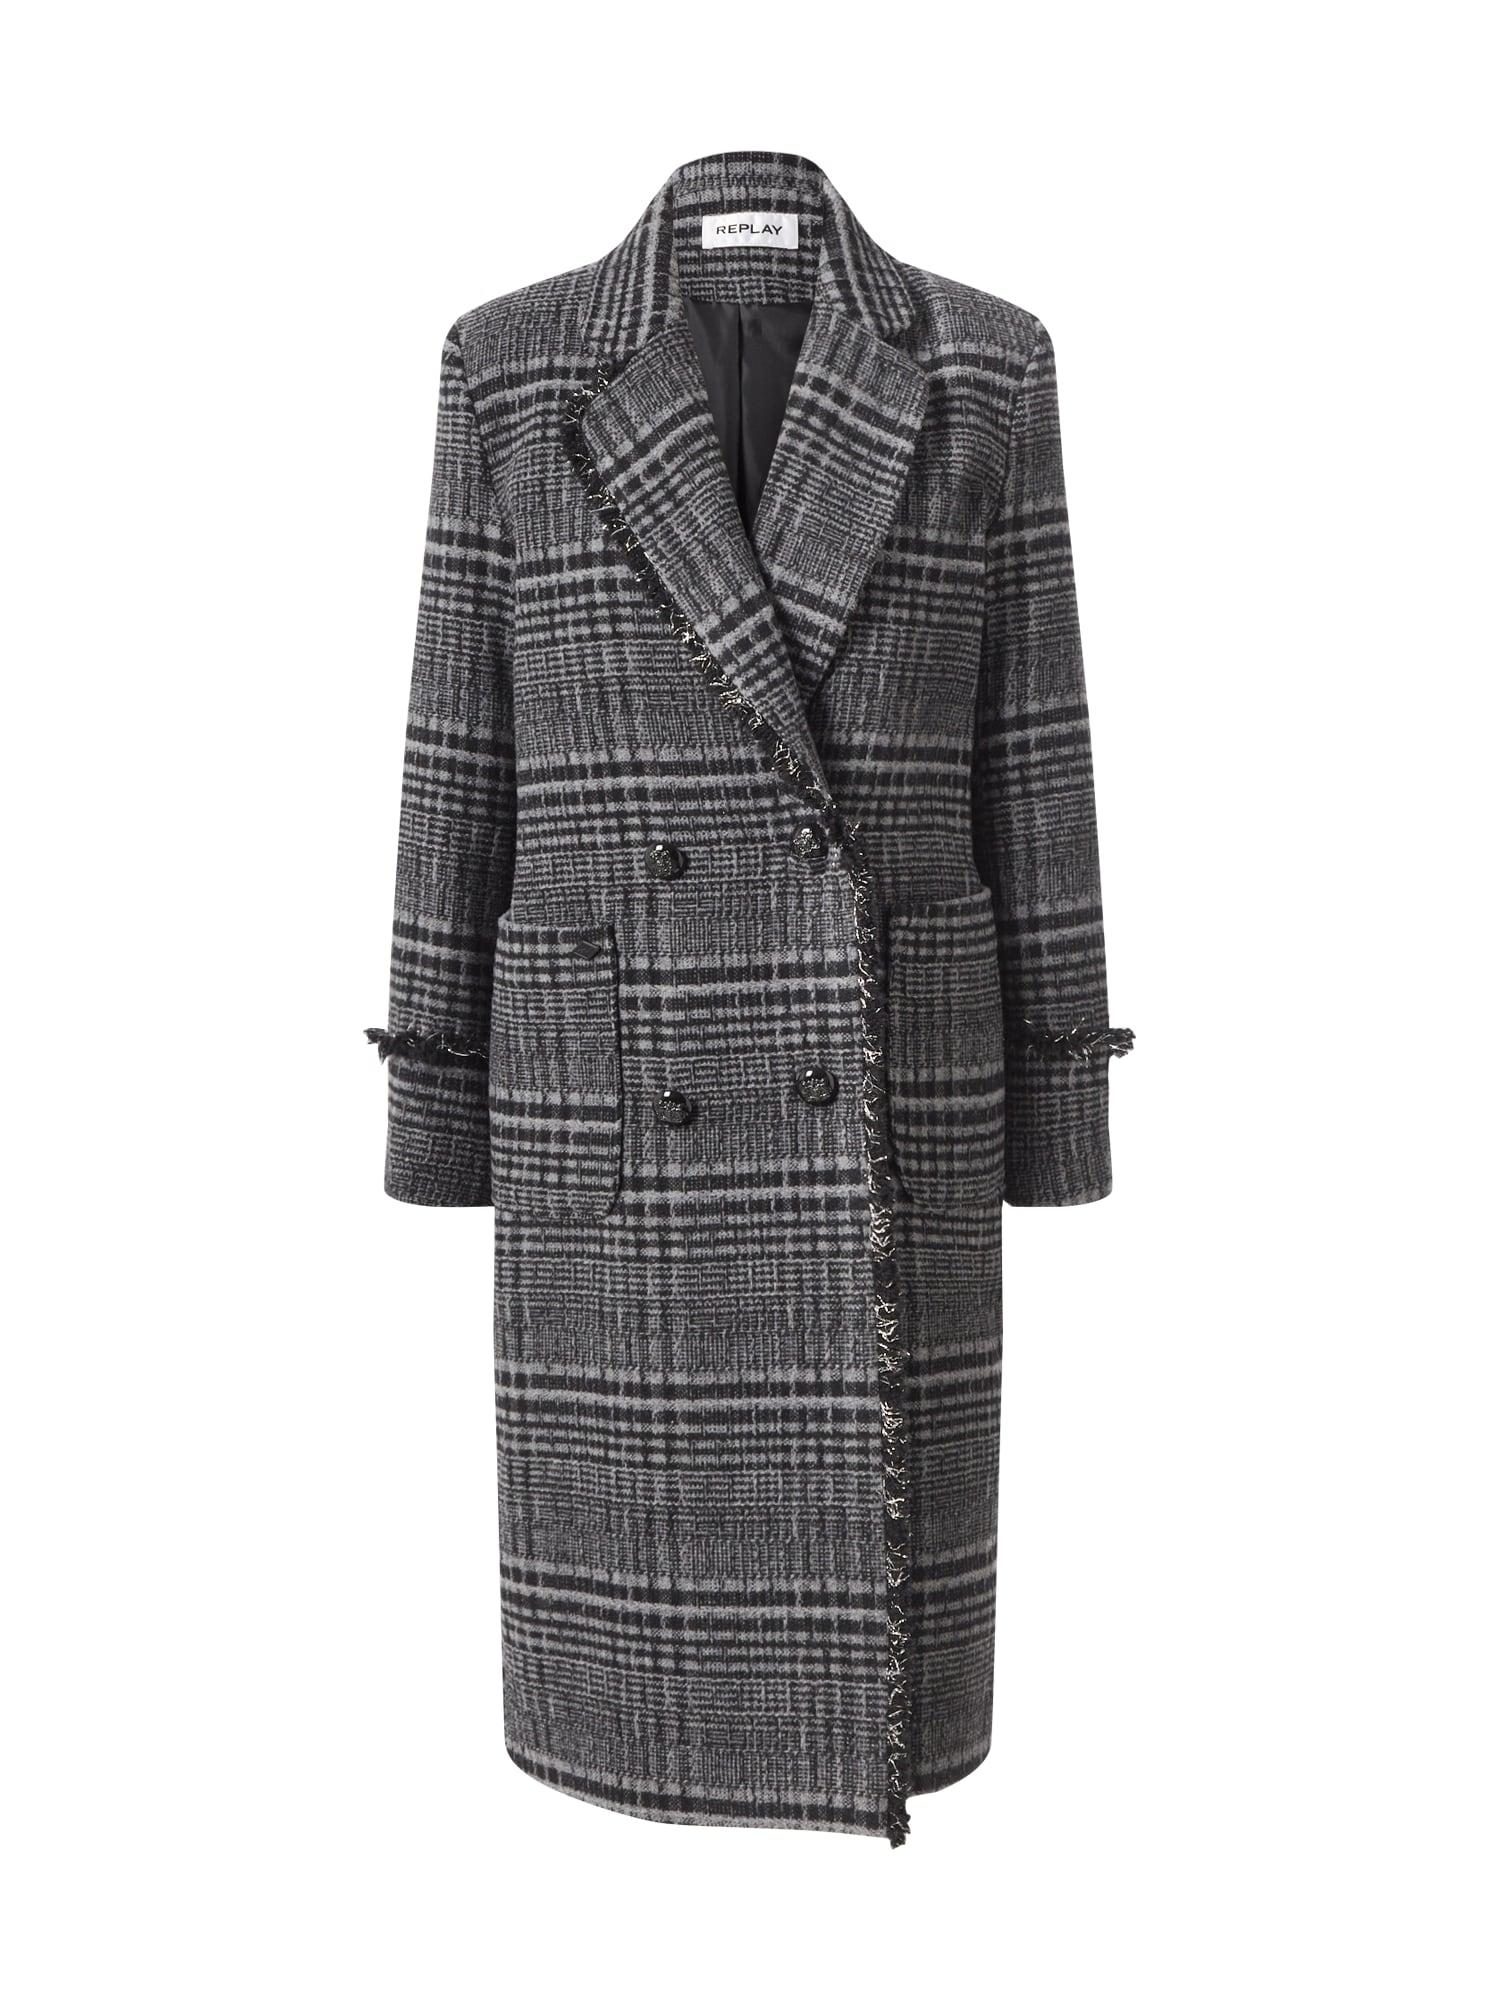 REPLAY Demisezoninis paltas juoda / pilka